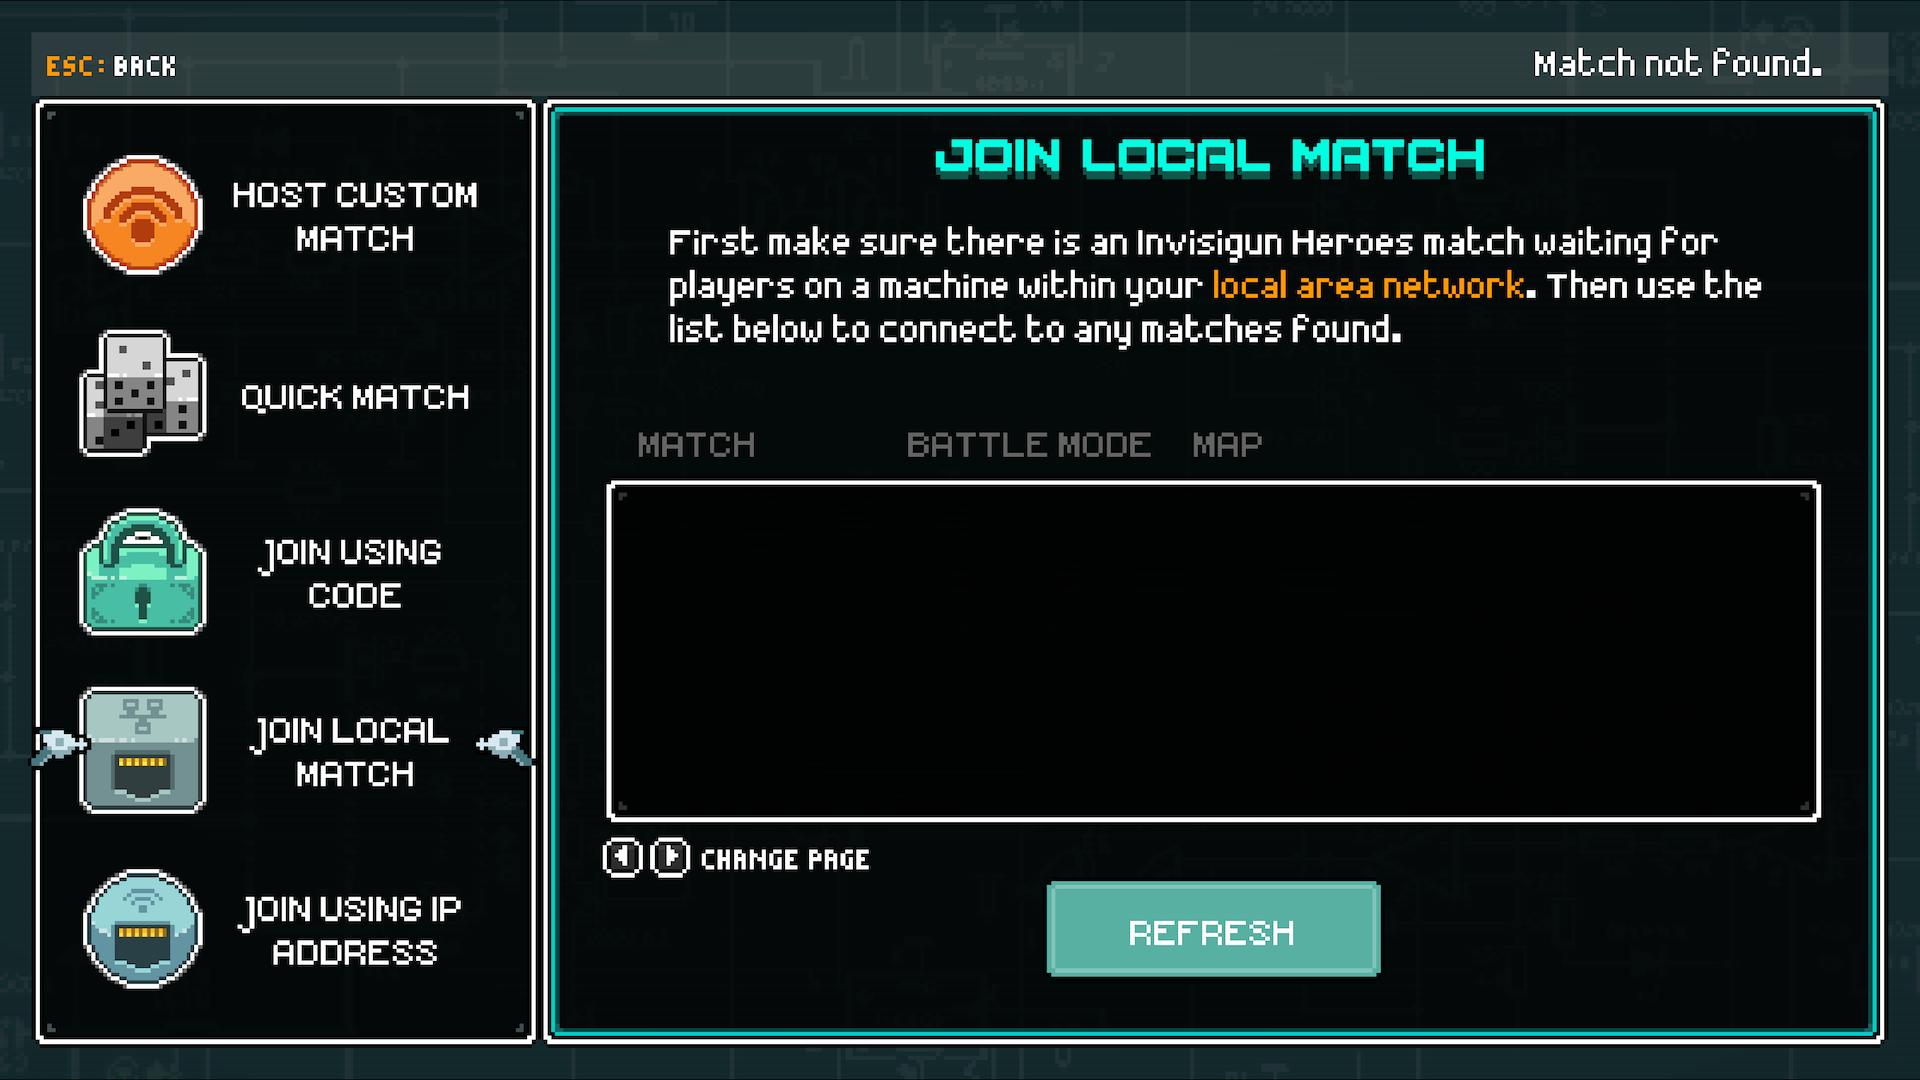 Join a Local LAN Match